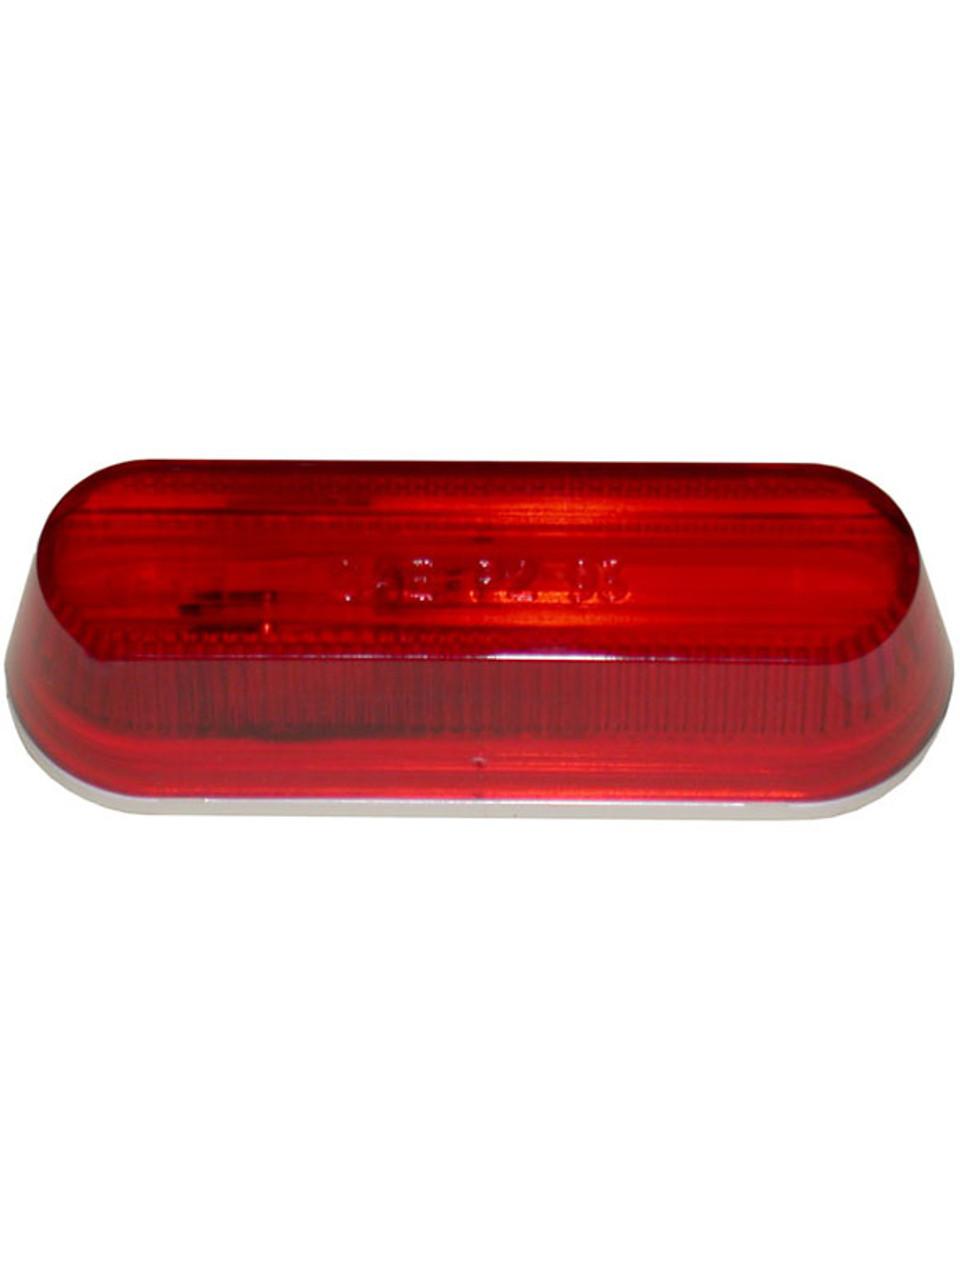 136R --- Oblong Clearance/Side Marker Light